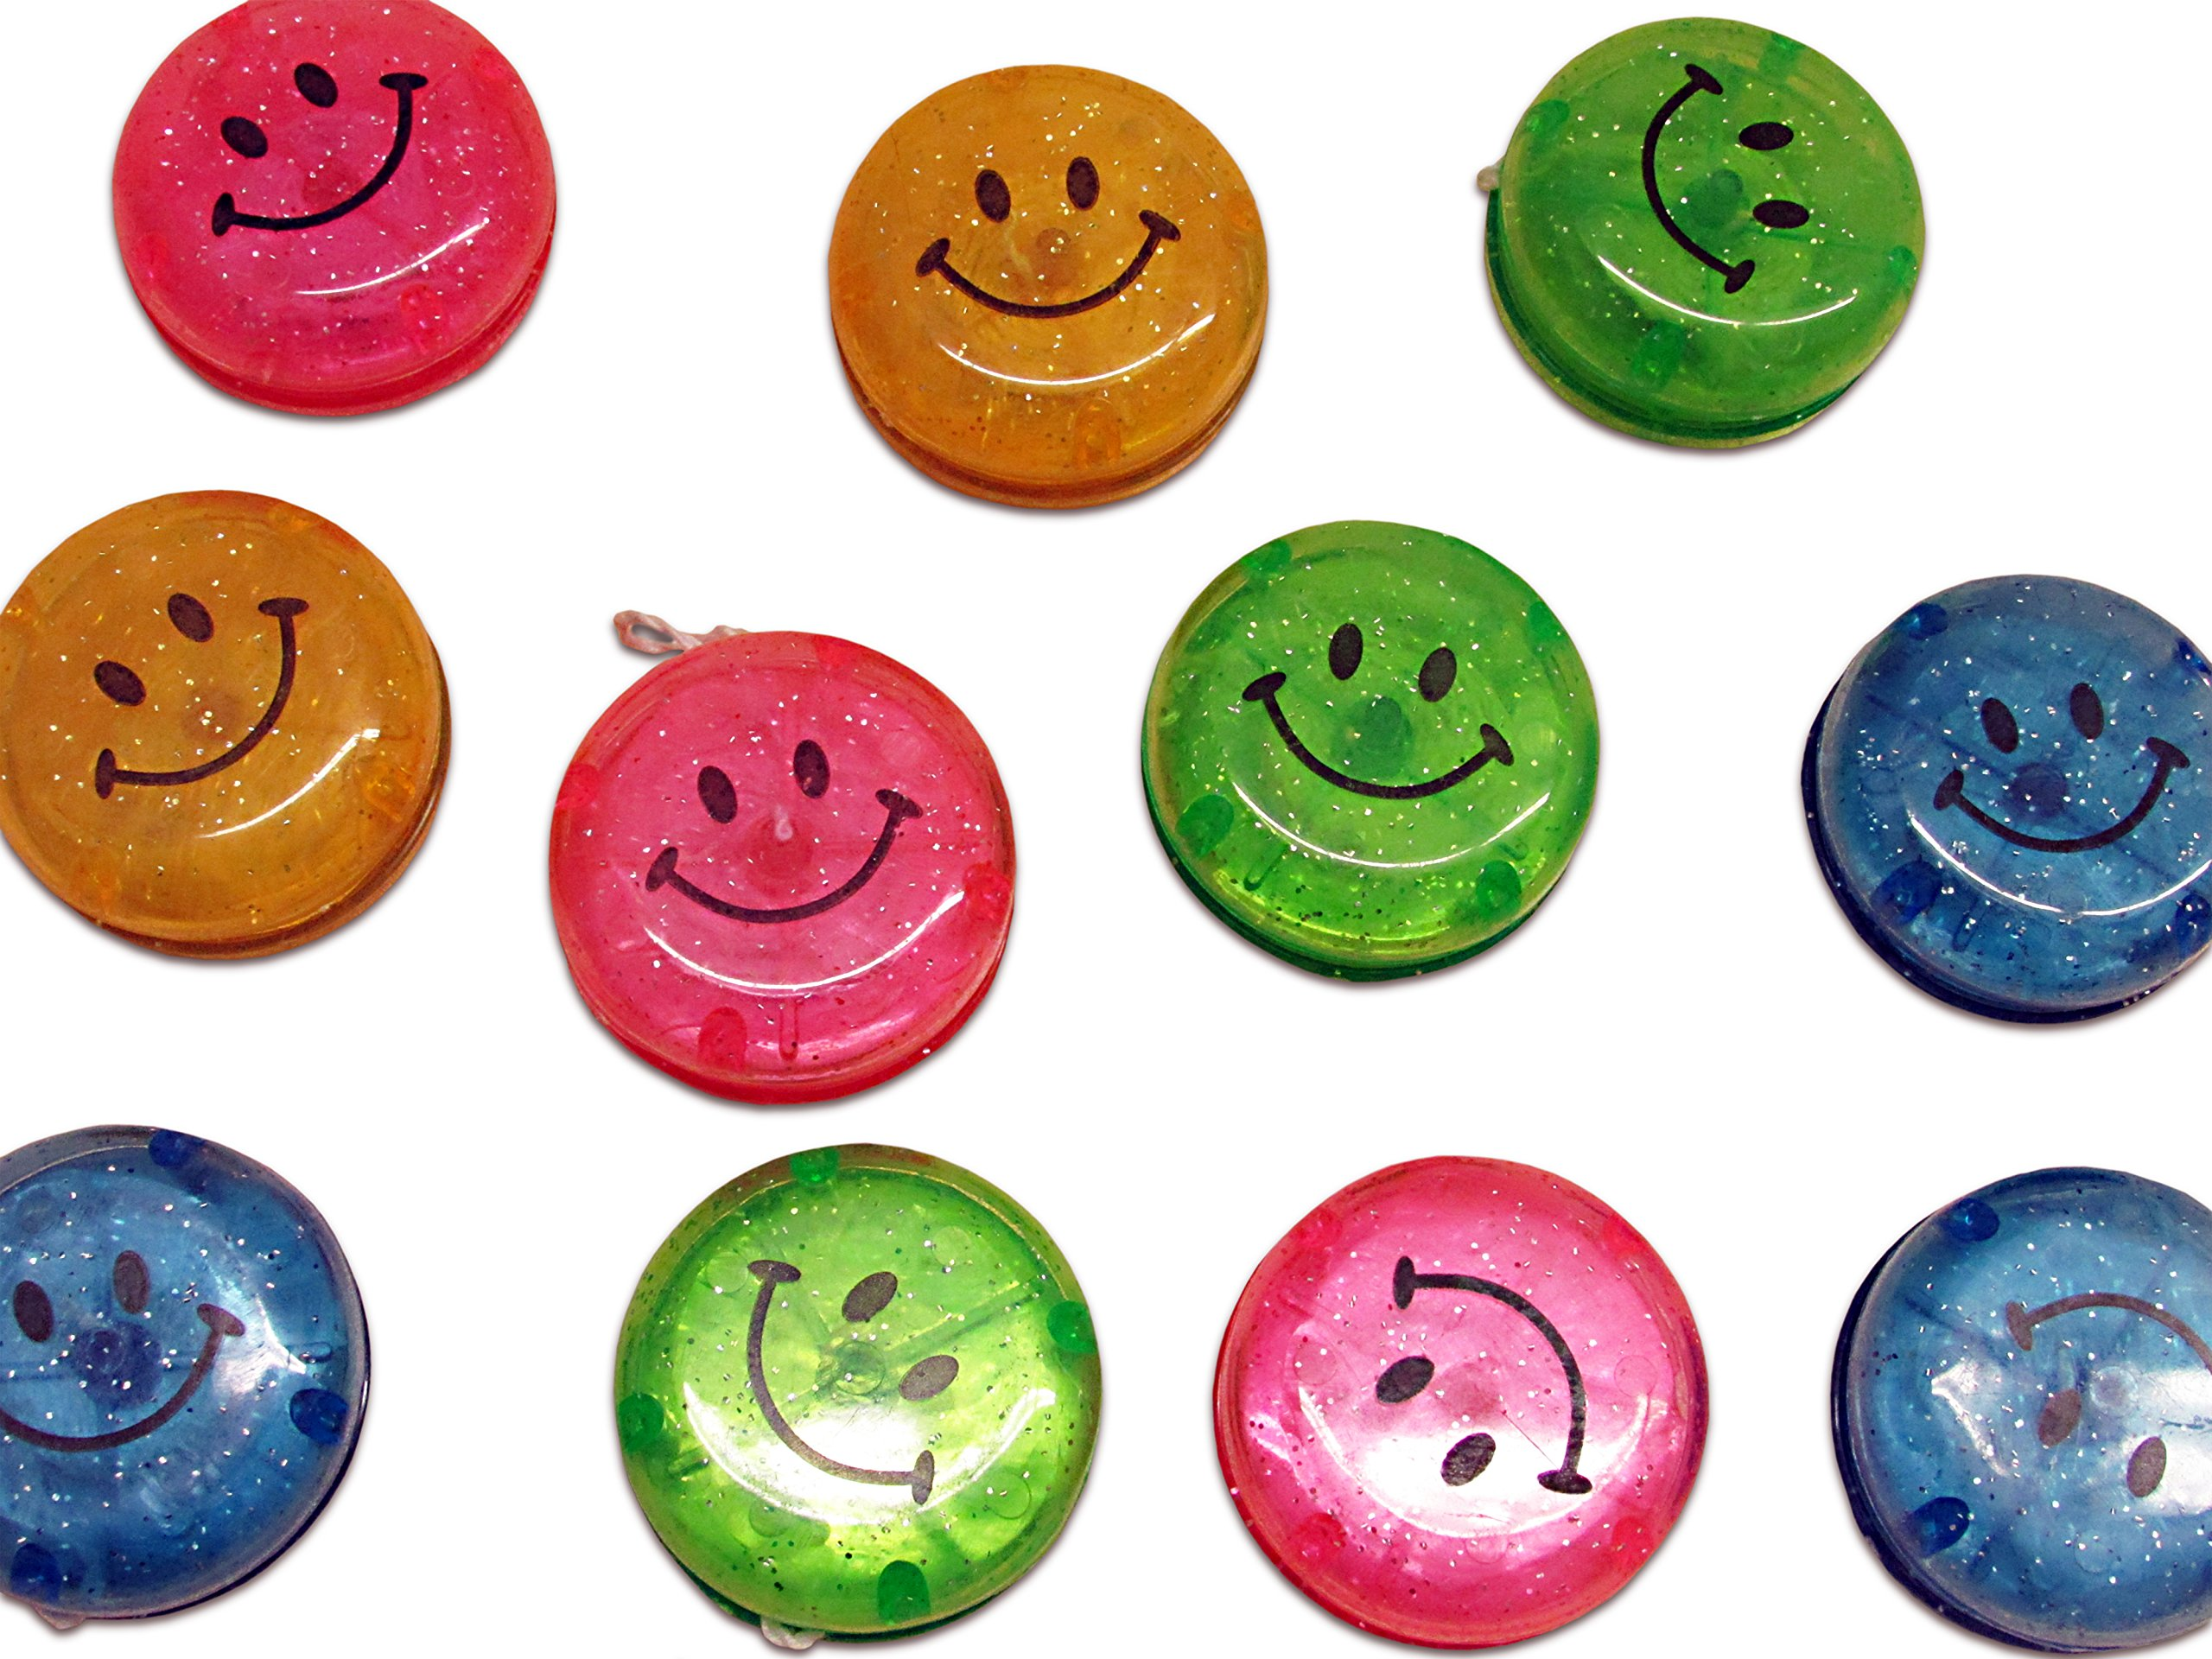 Dazzling Toys Party Favor Set Glitter Smiley Yo-yos 24 Pack.